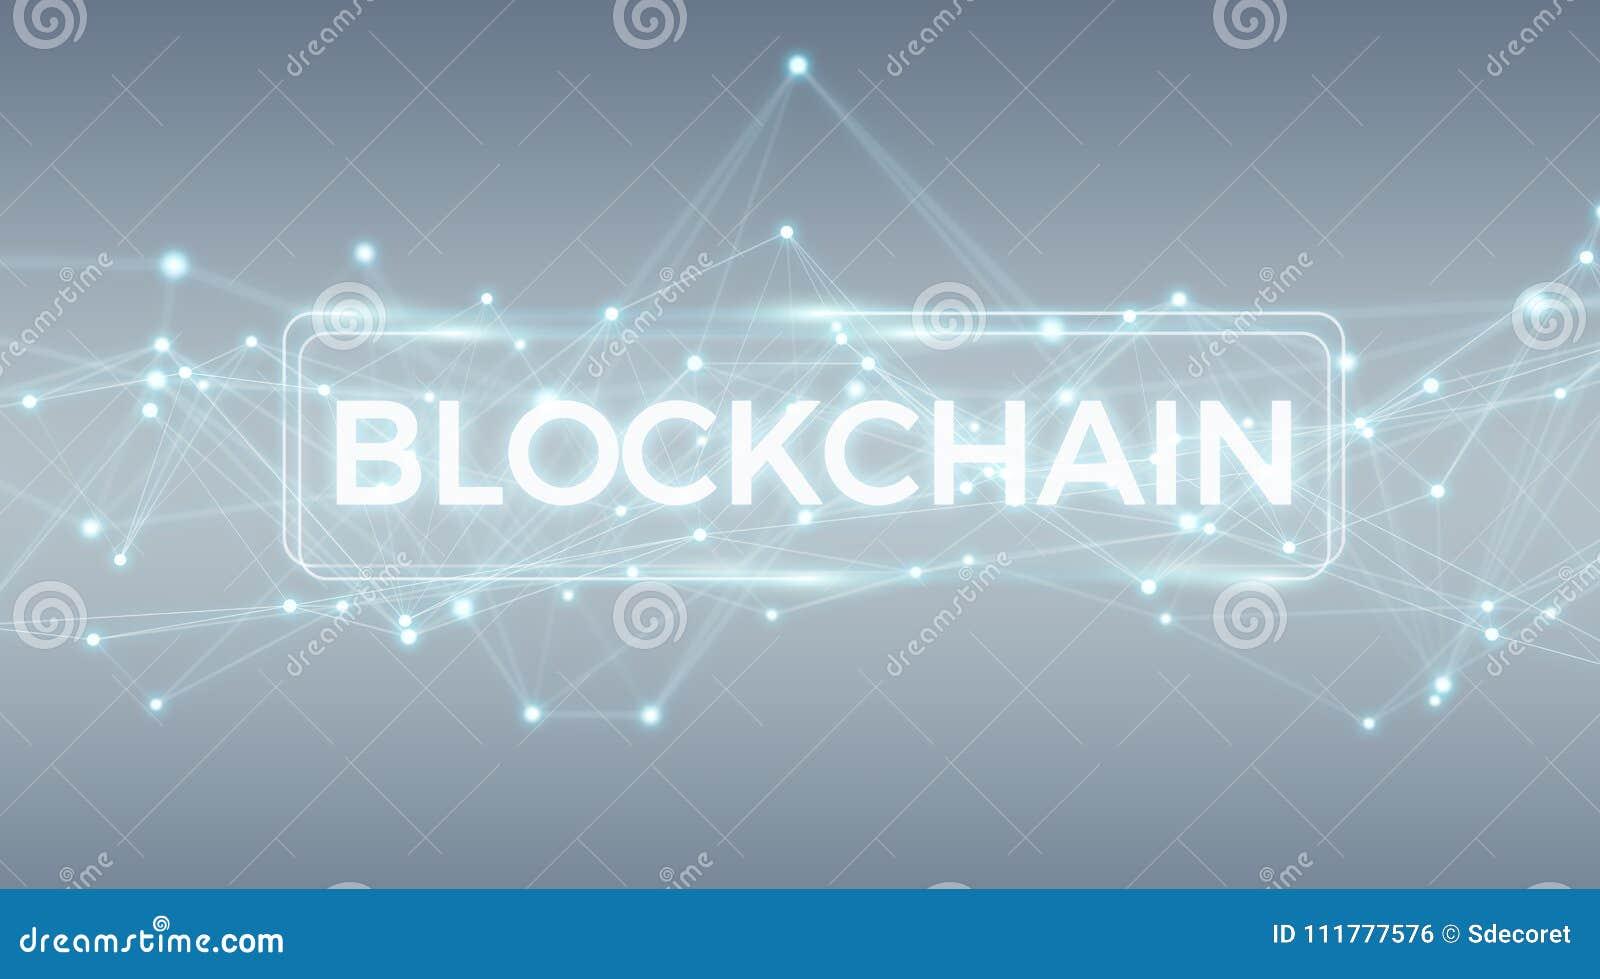 Blockchain connection background 3D rendering